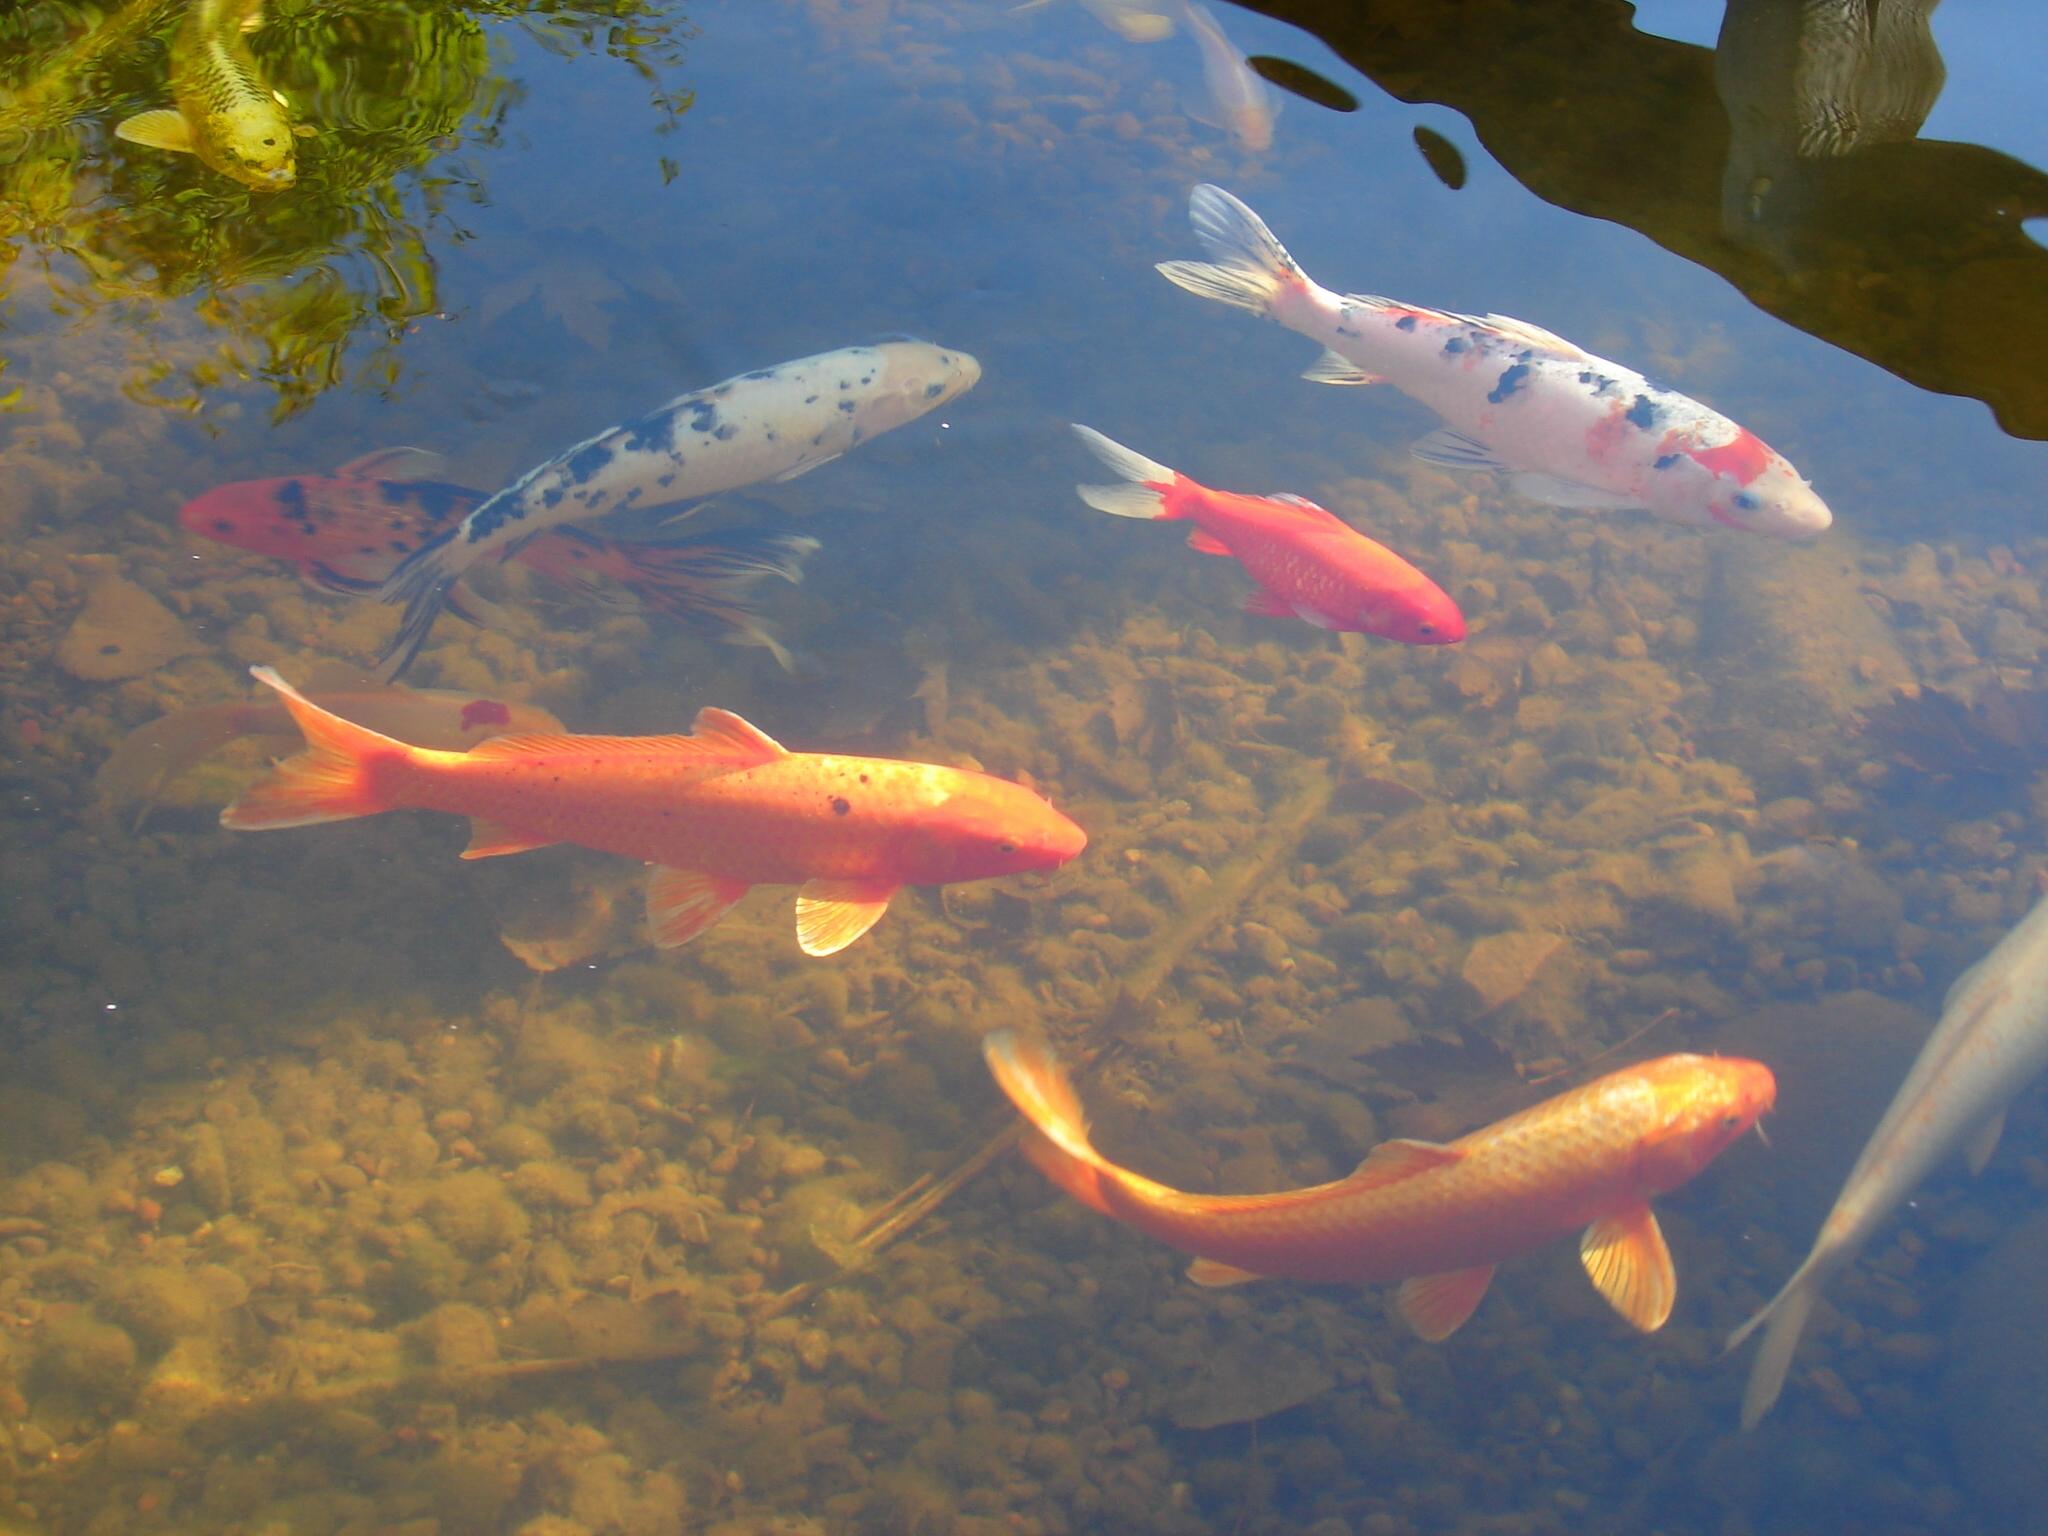 Nishikigoi koi carp fish 4 by fantasystock on deviantart for Fraie carpe koi